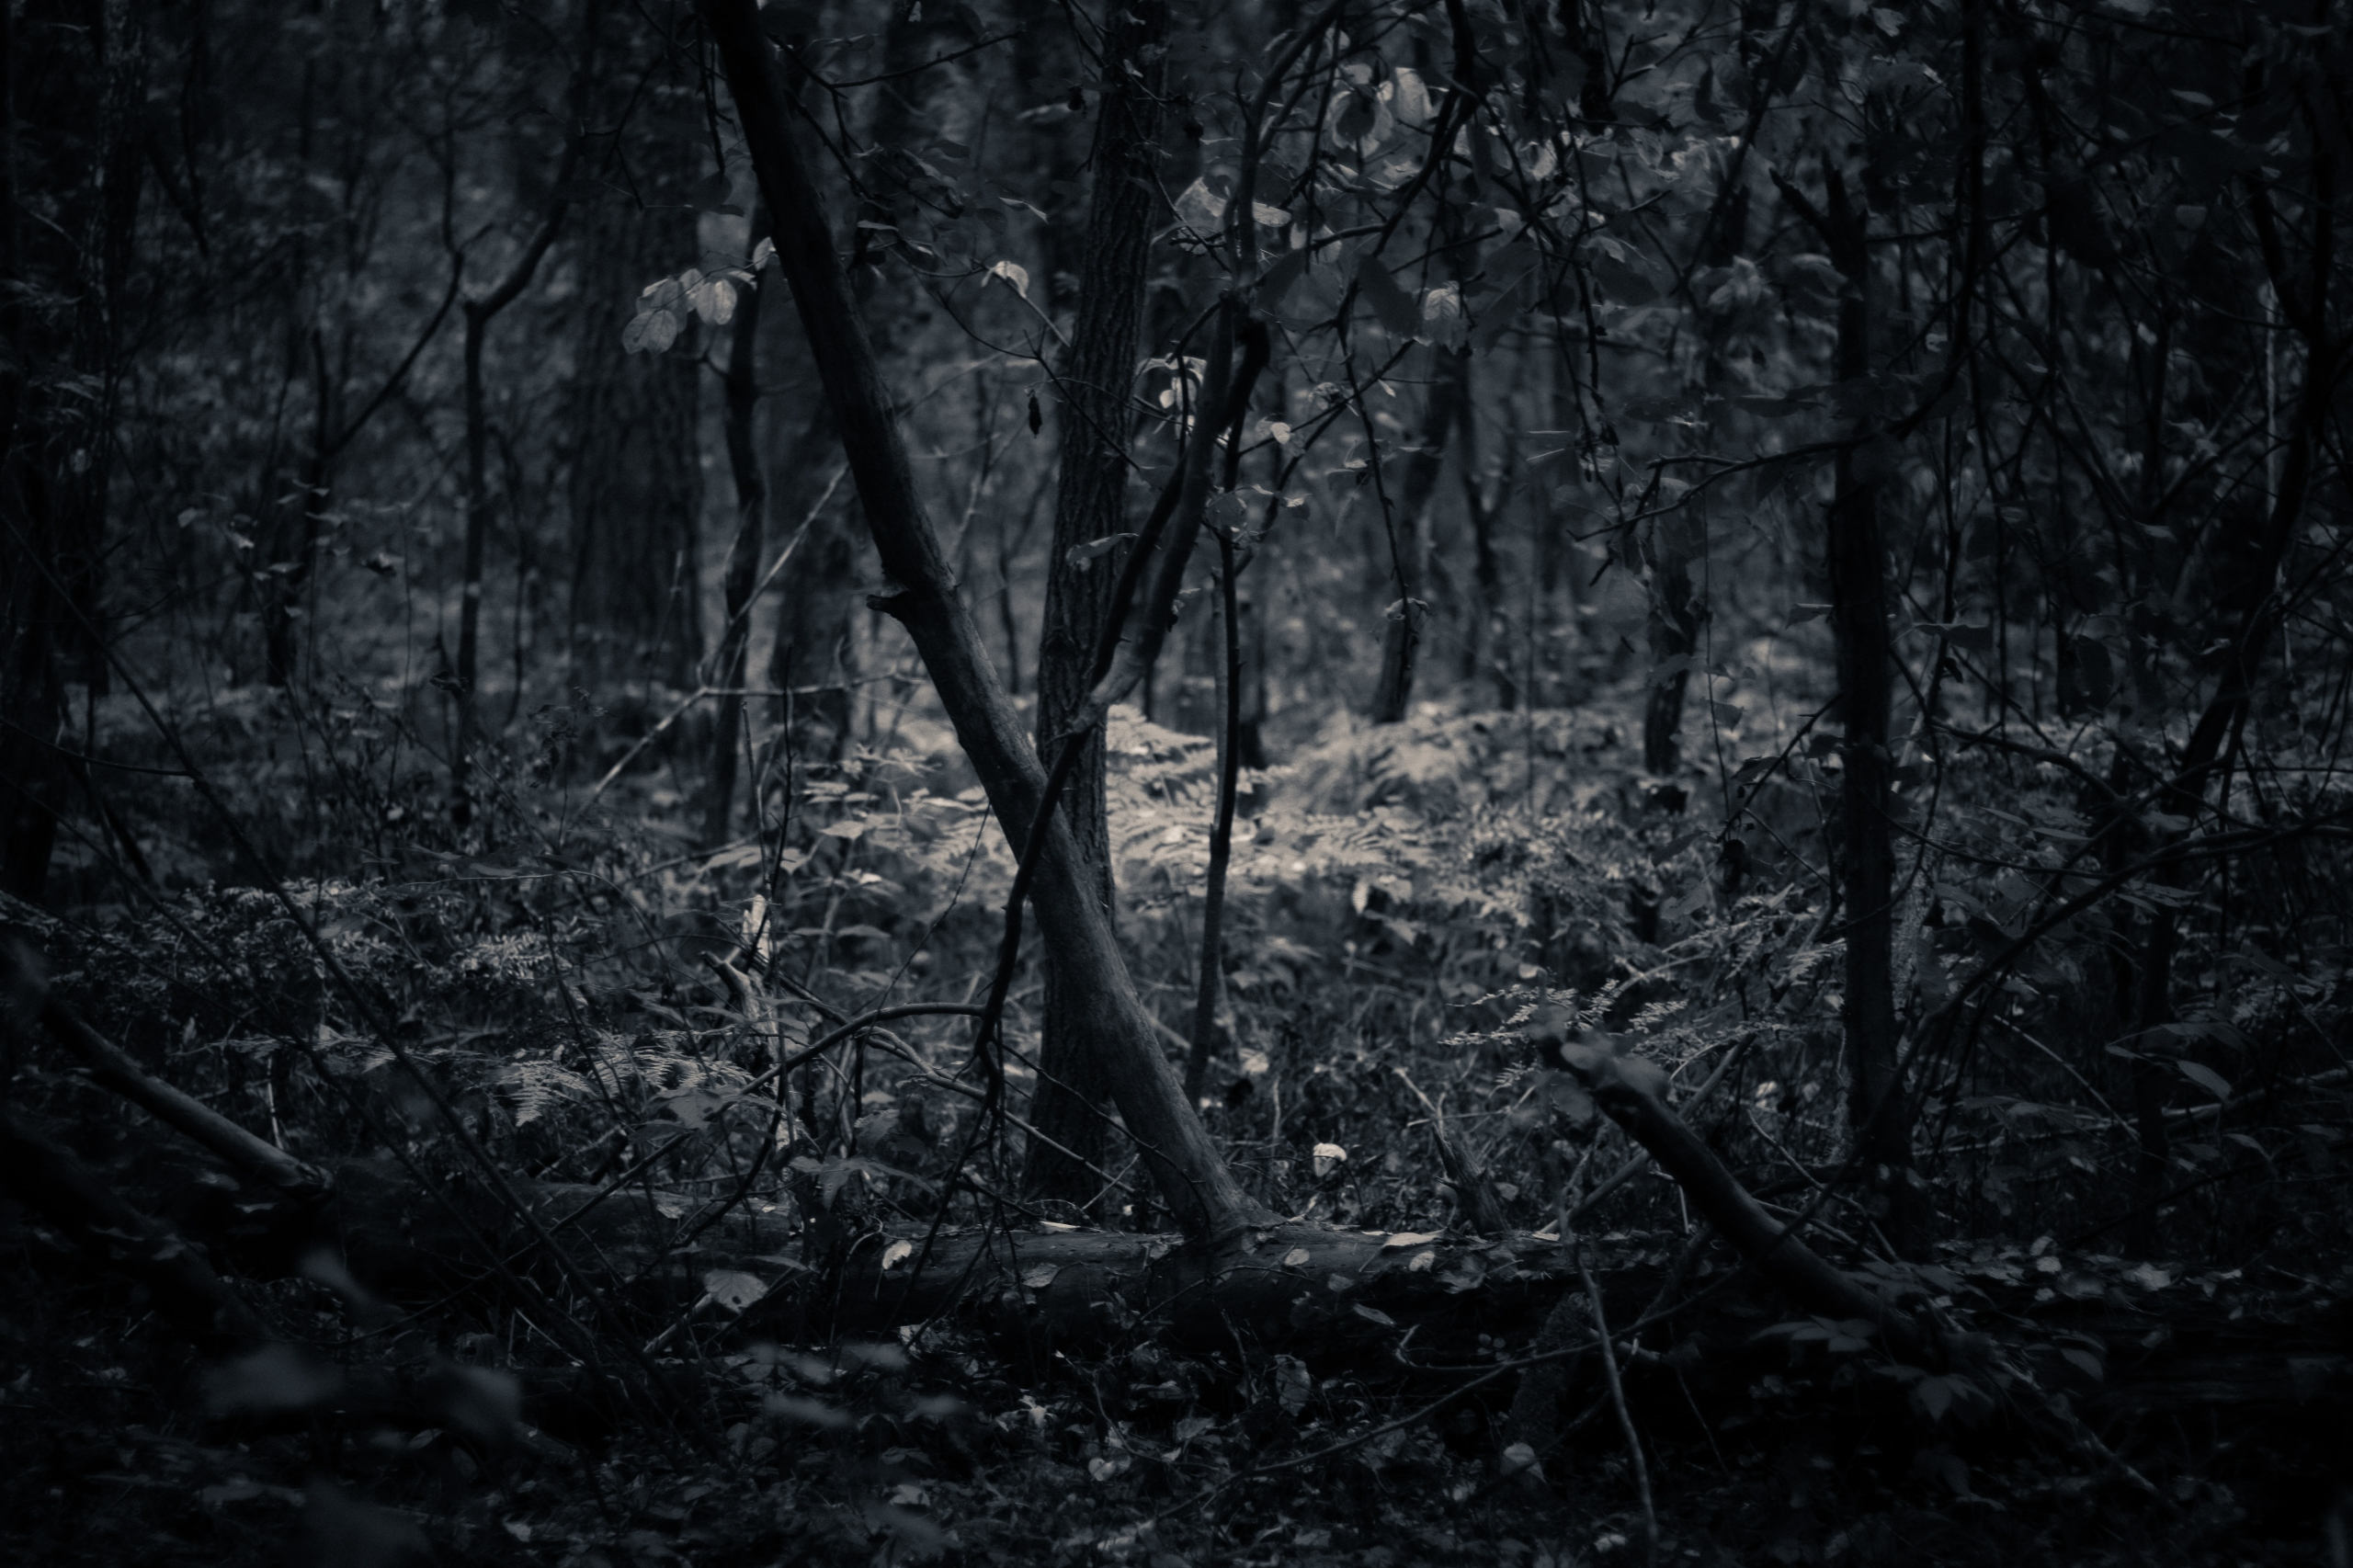 lithuania, lietuva, лес, forest - beheroght   ello